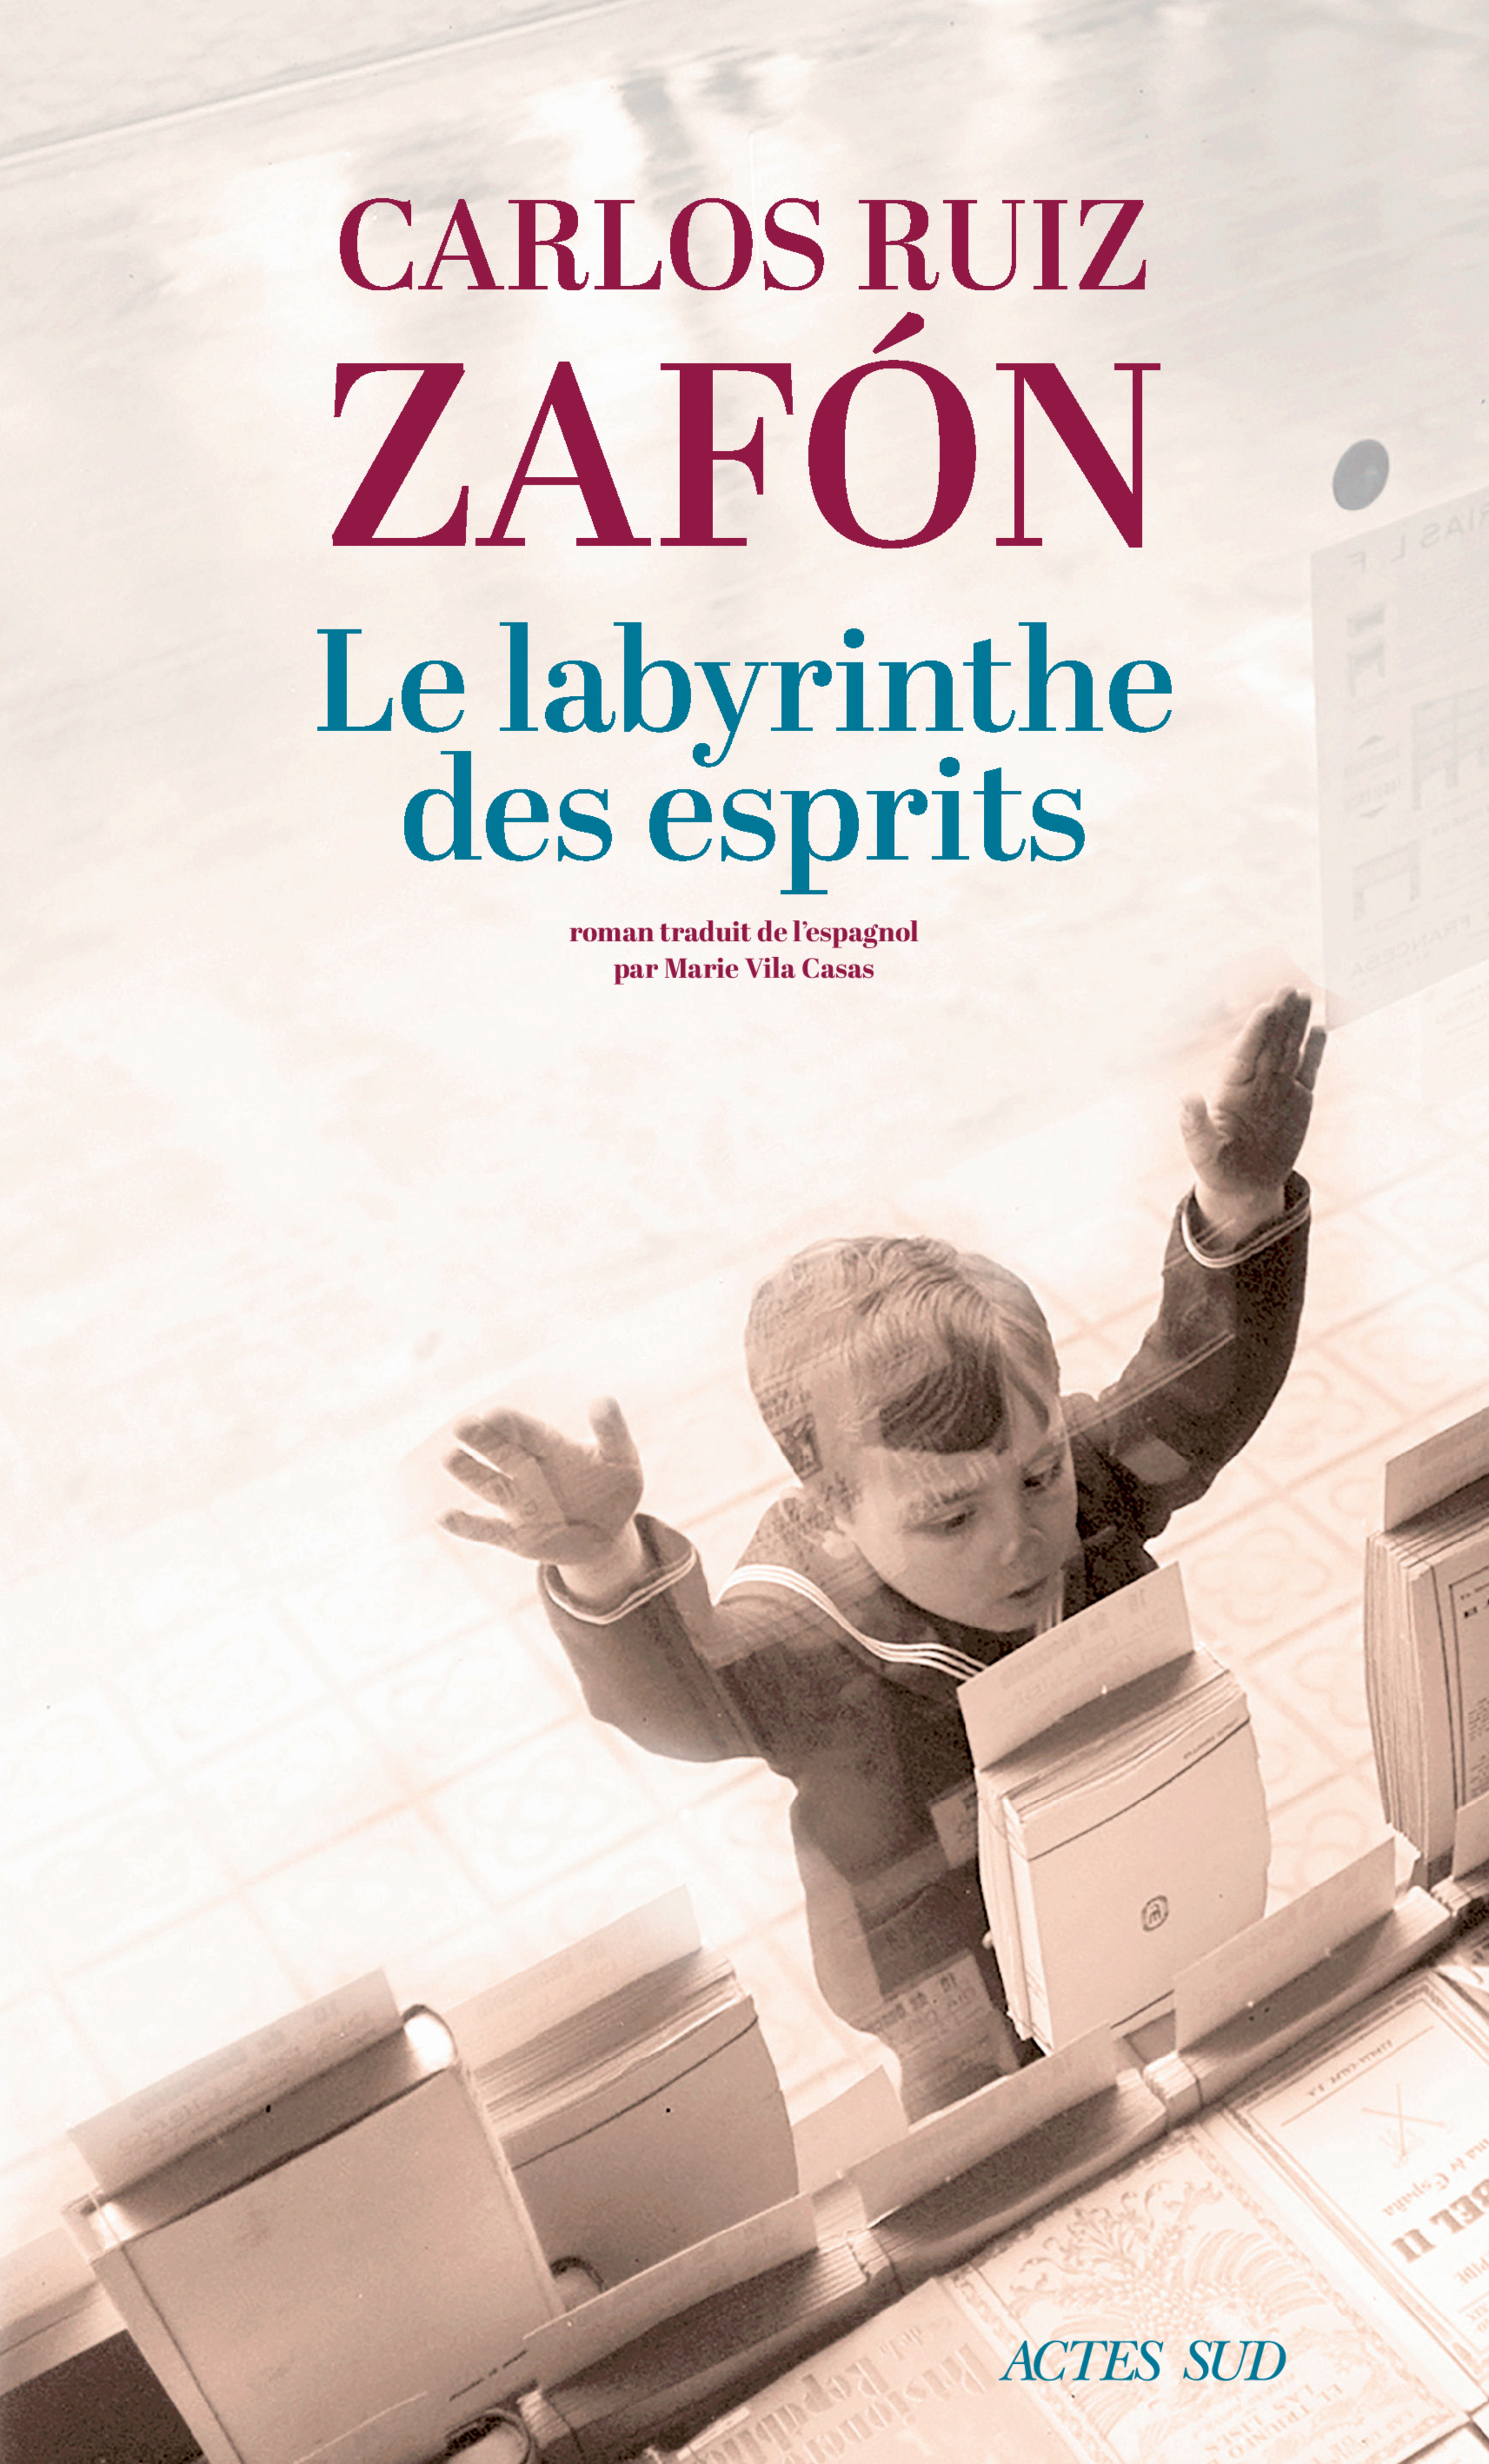 Le Labyrinthe des esprits | Zafon, Carlos ruiz